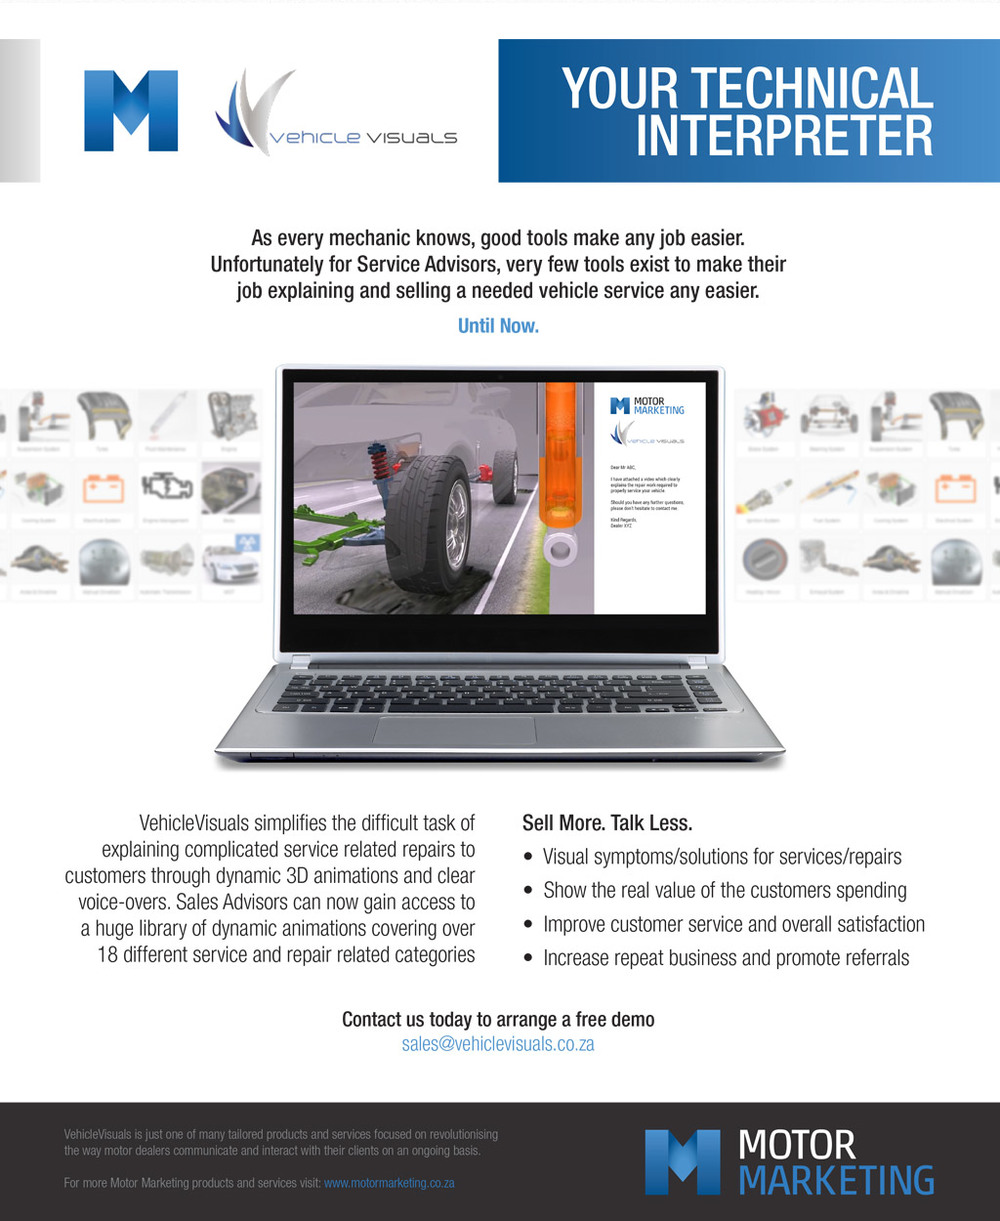 VehicleVisuals - Your Technical Interpreter